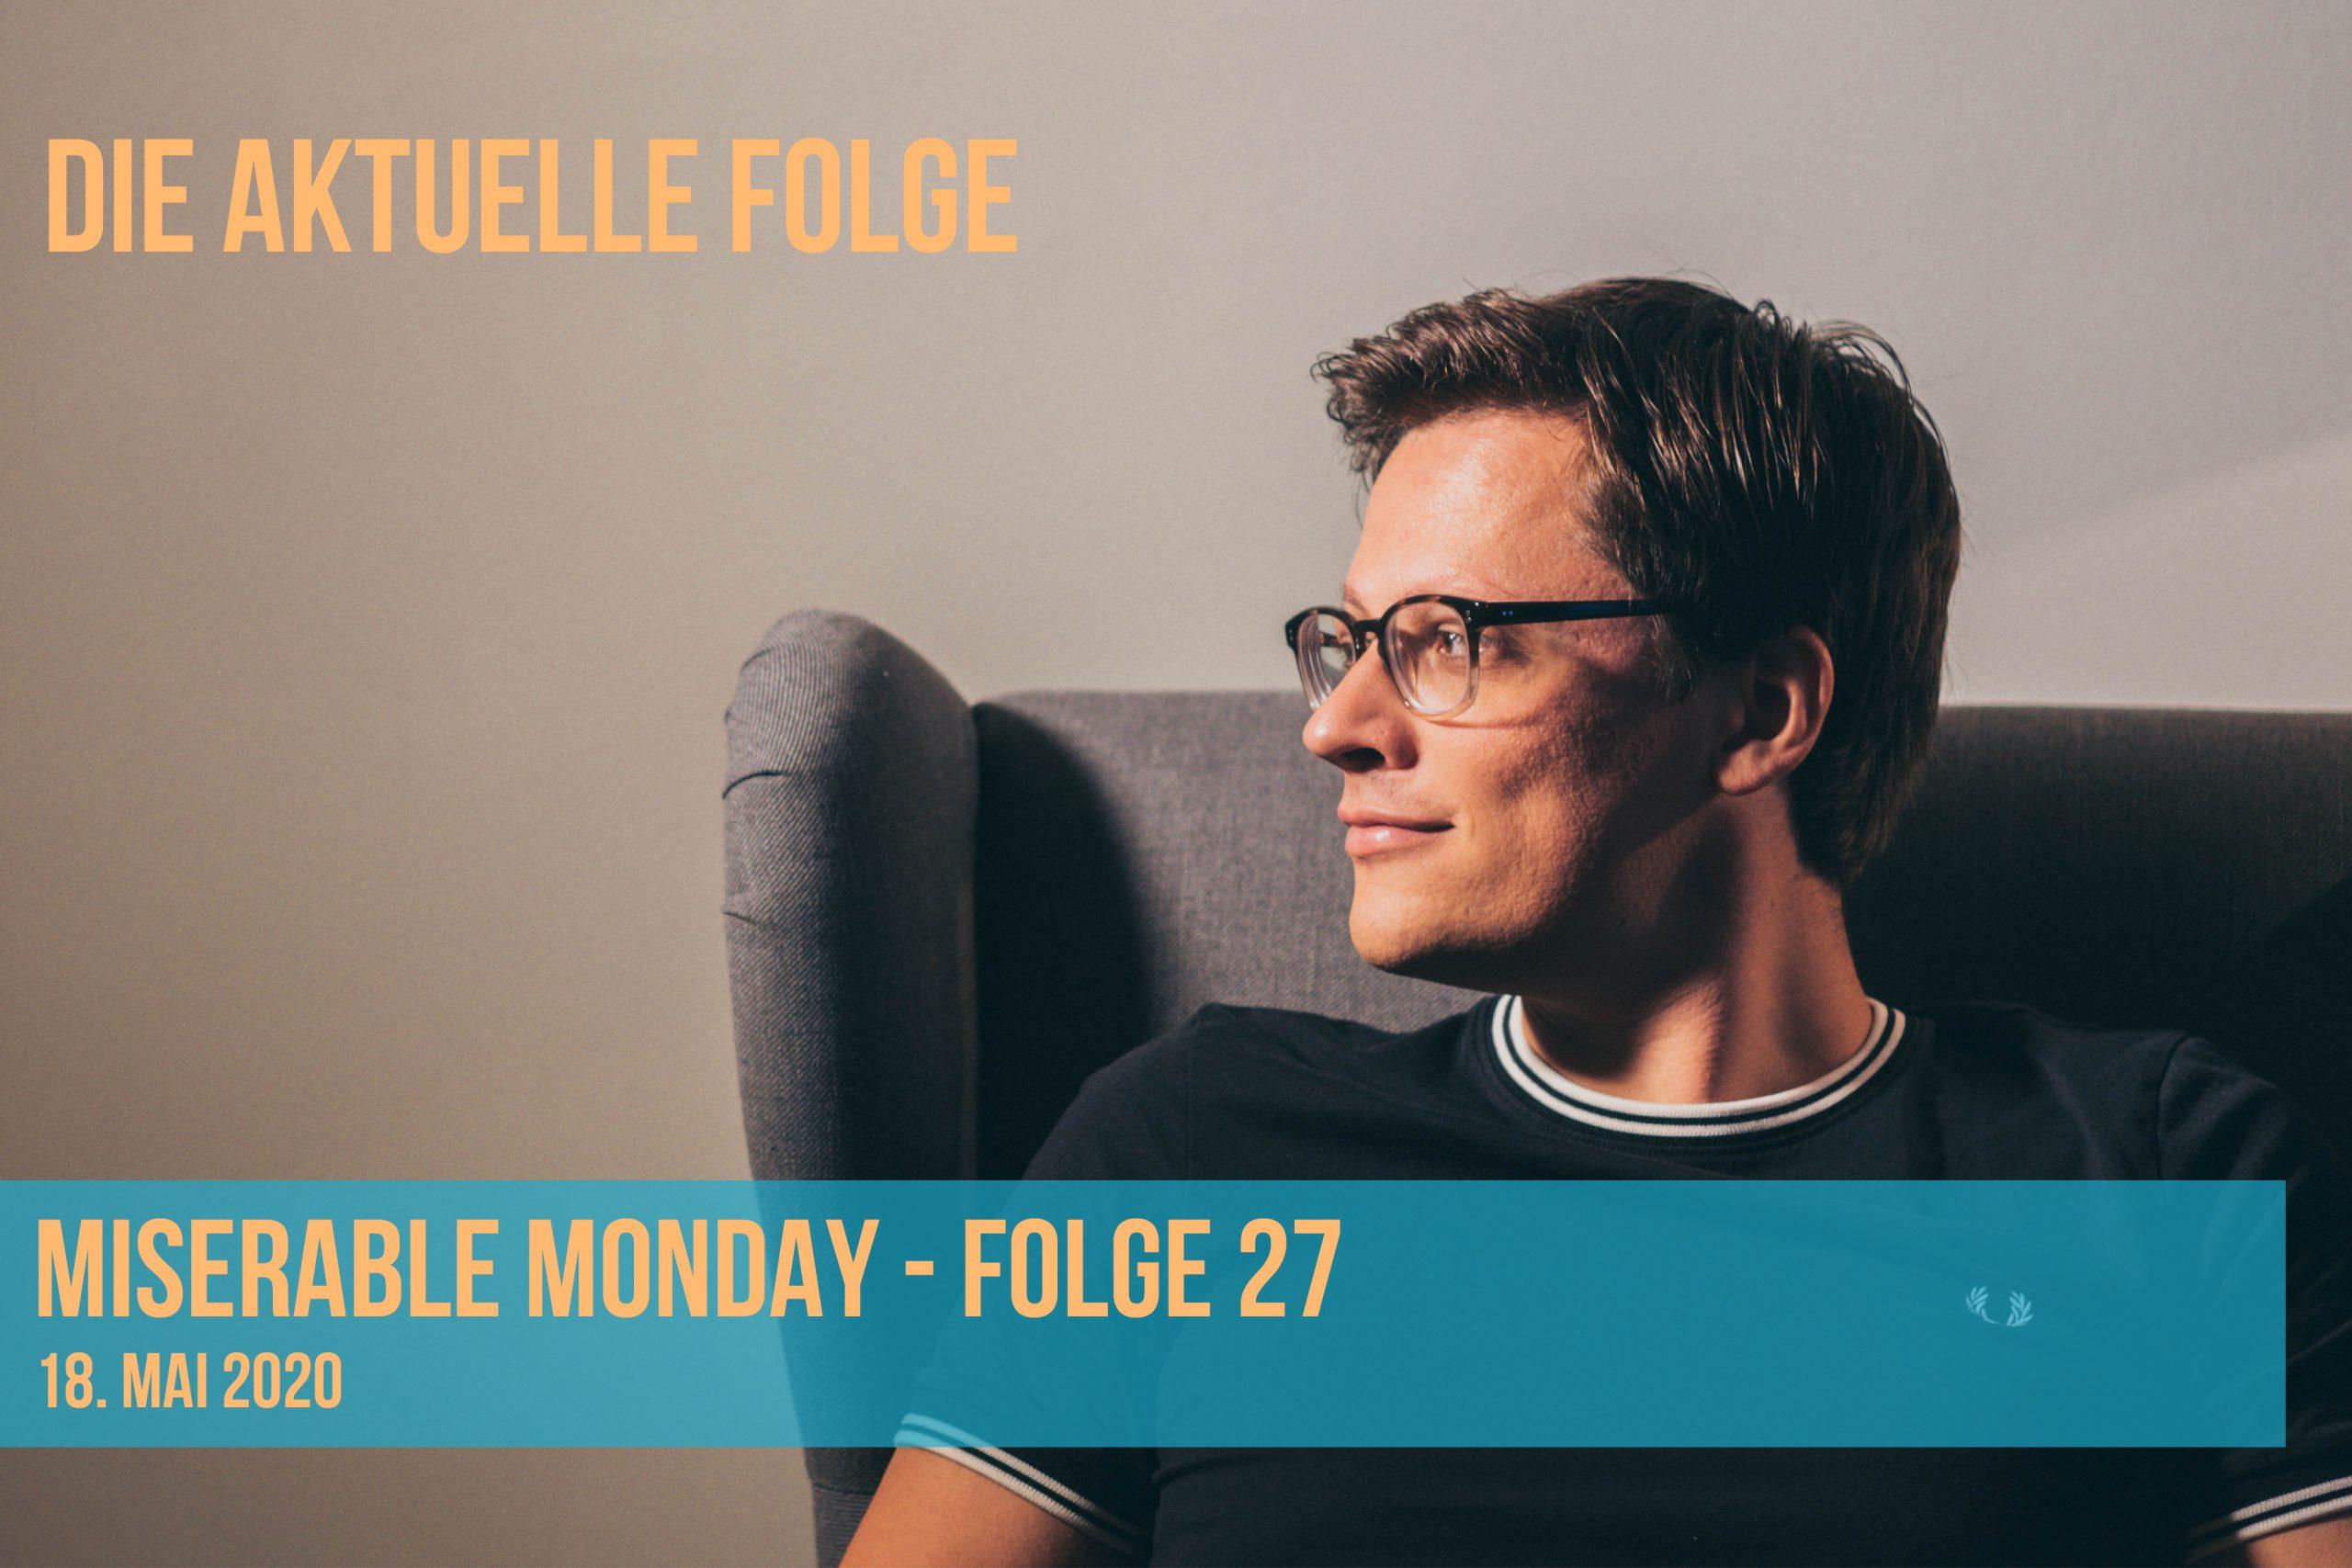 Miserable Monday - Folge 27